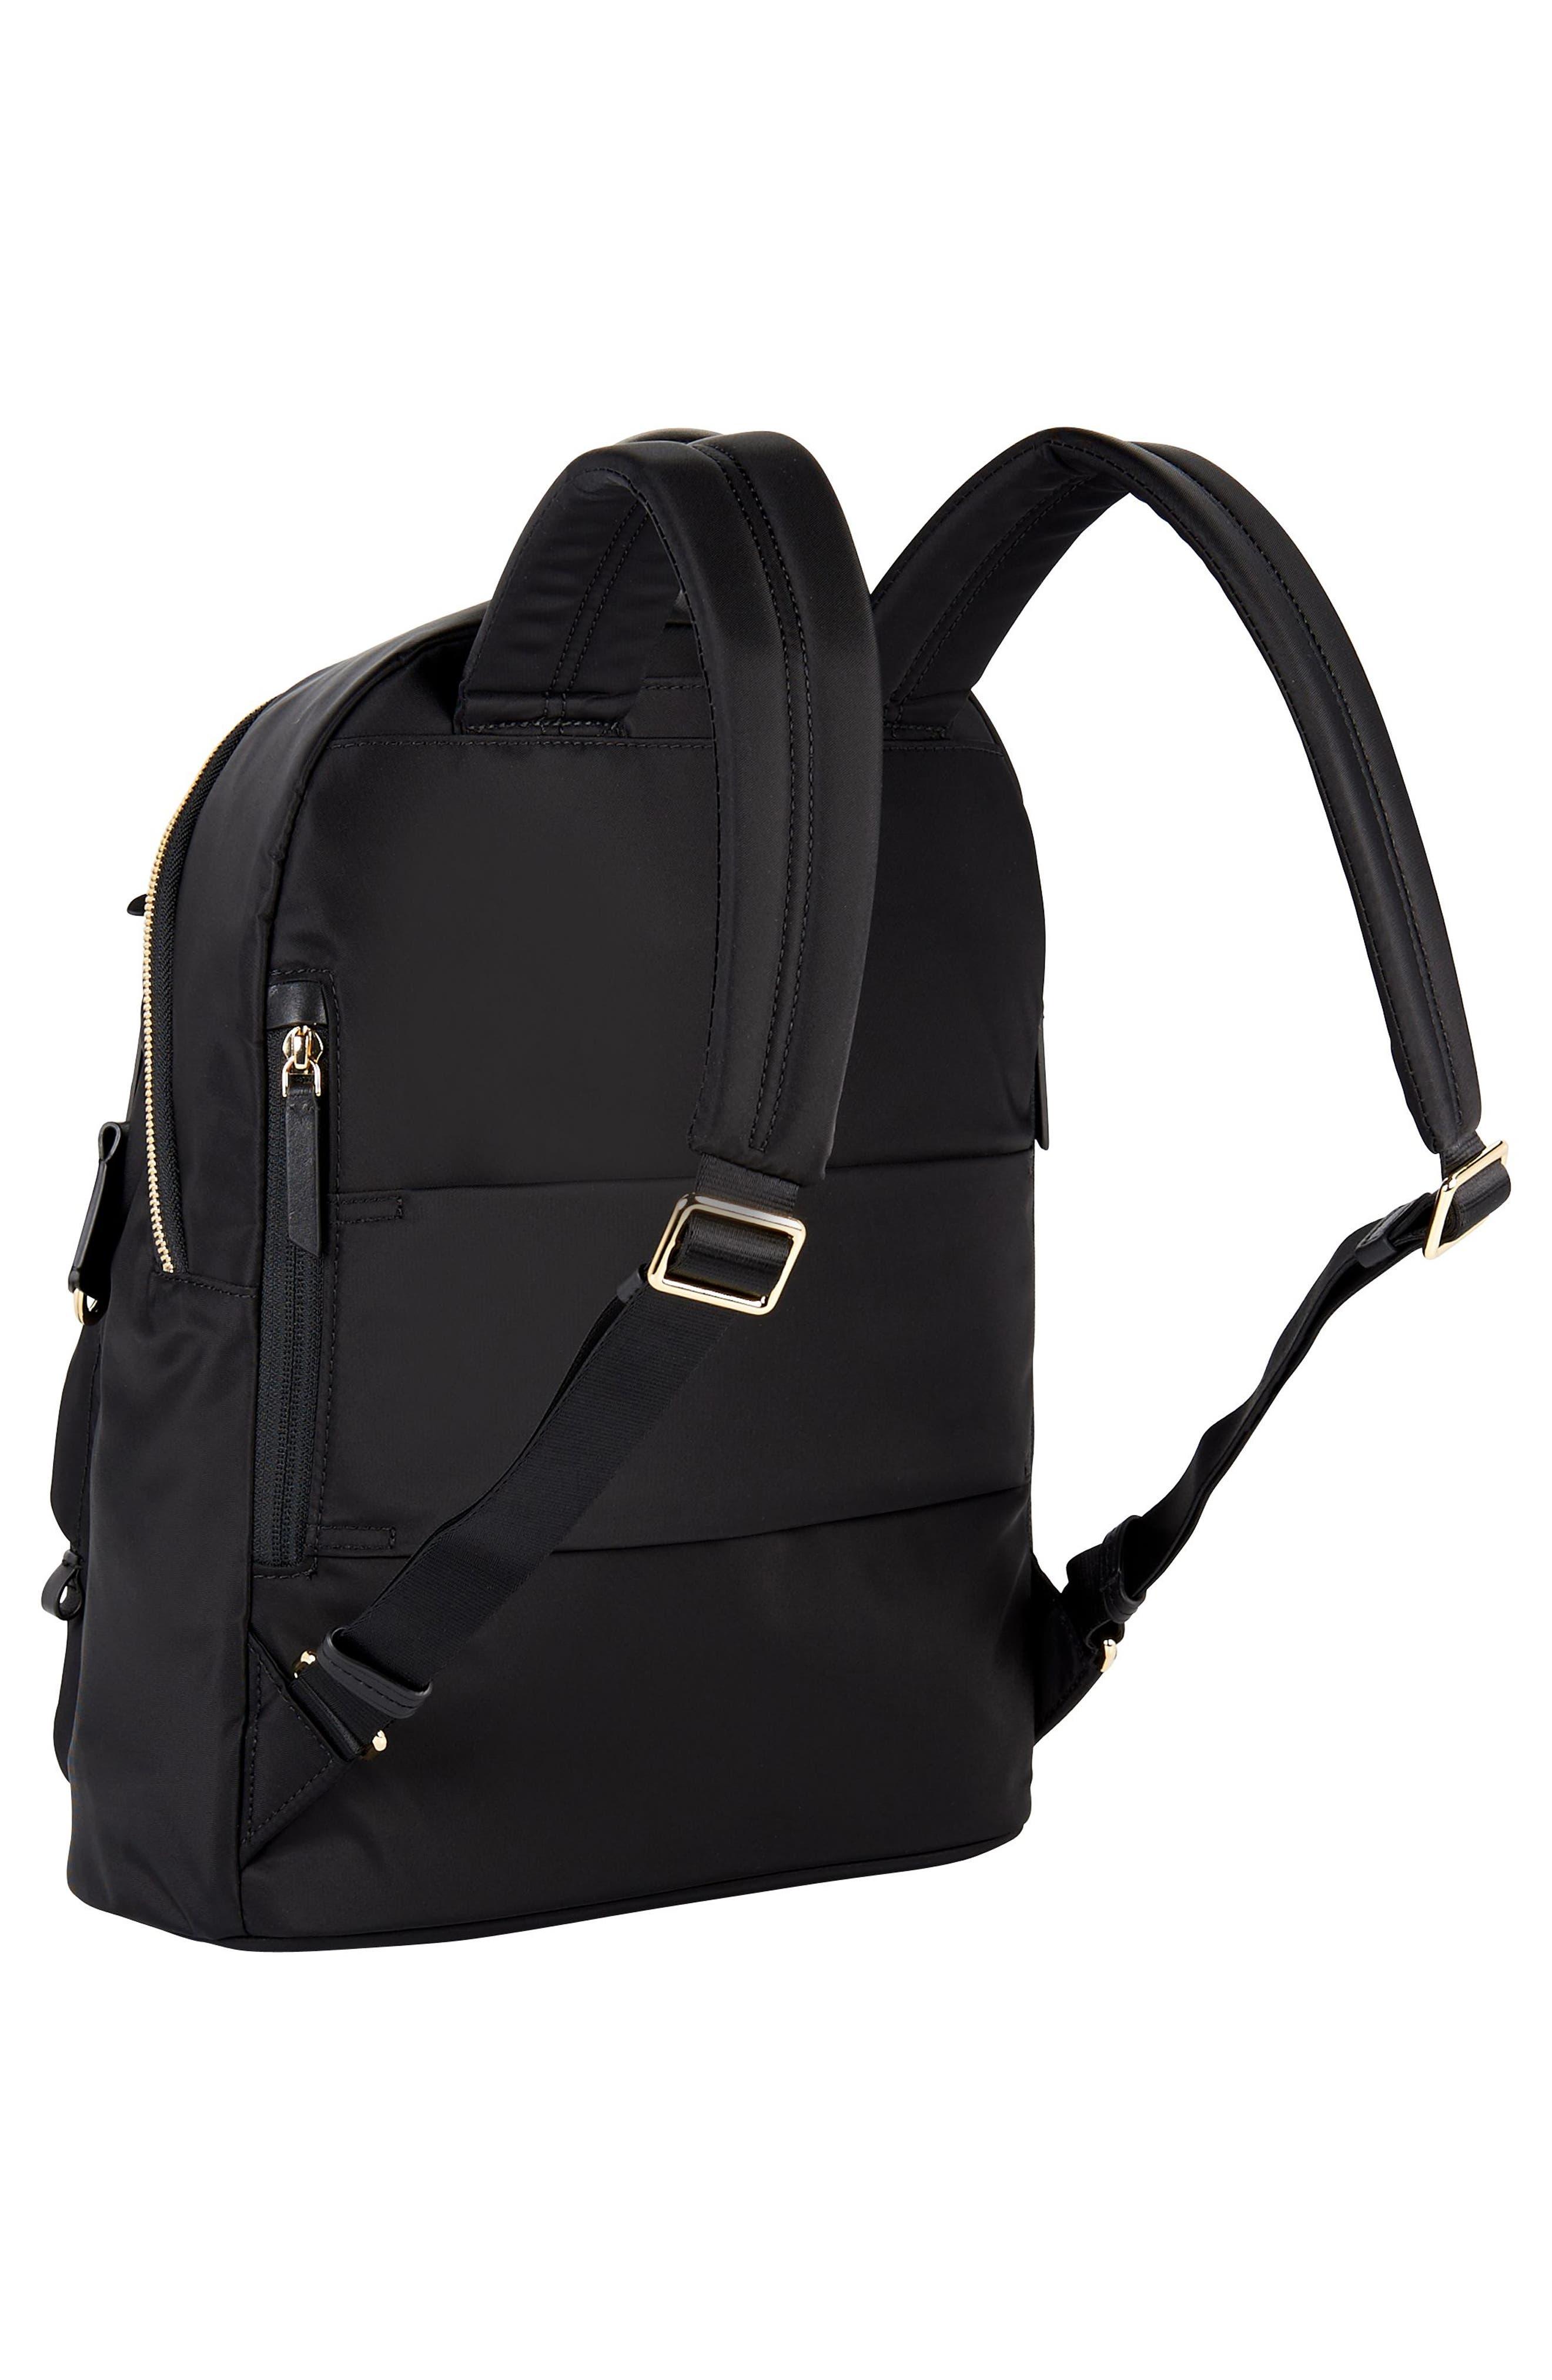 Voyageur Hagen Nylon Backpack,                             Alternate thumbnail 3, color,                             BLACK